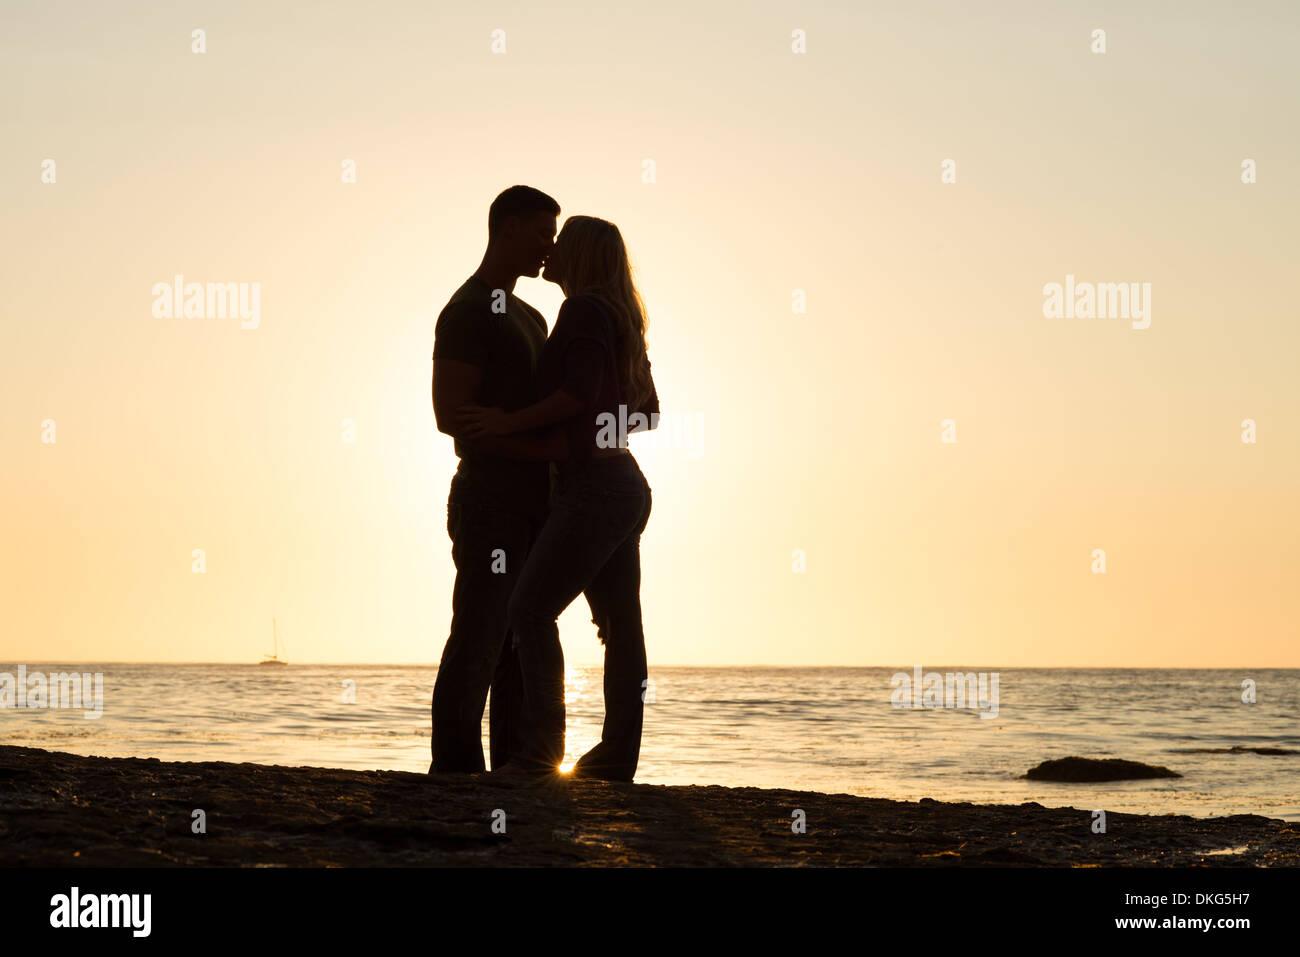 Dating-Ort in san diego Geschwindigkeit datiert beijing